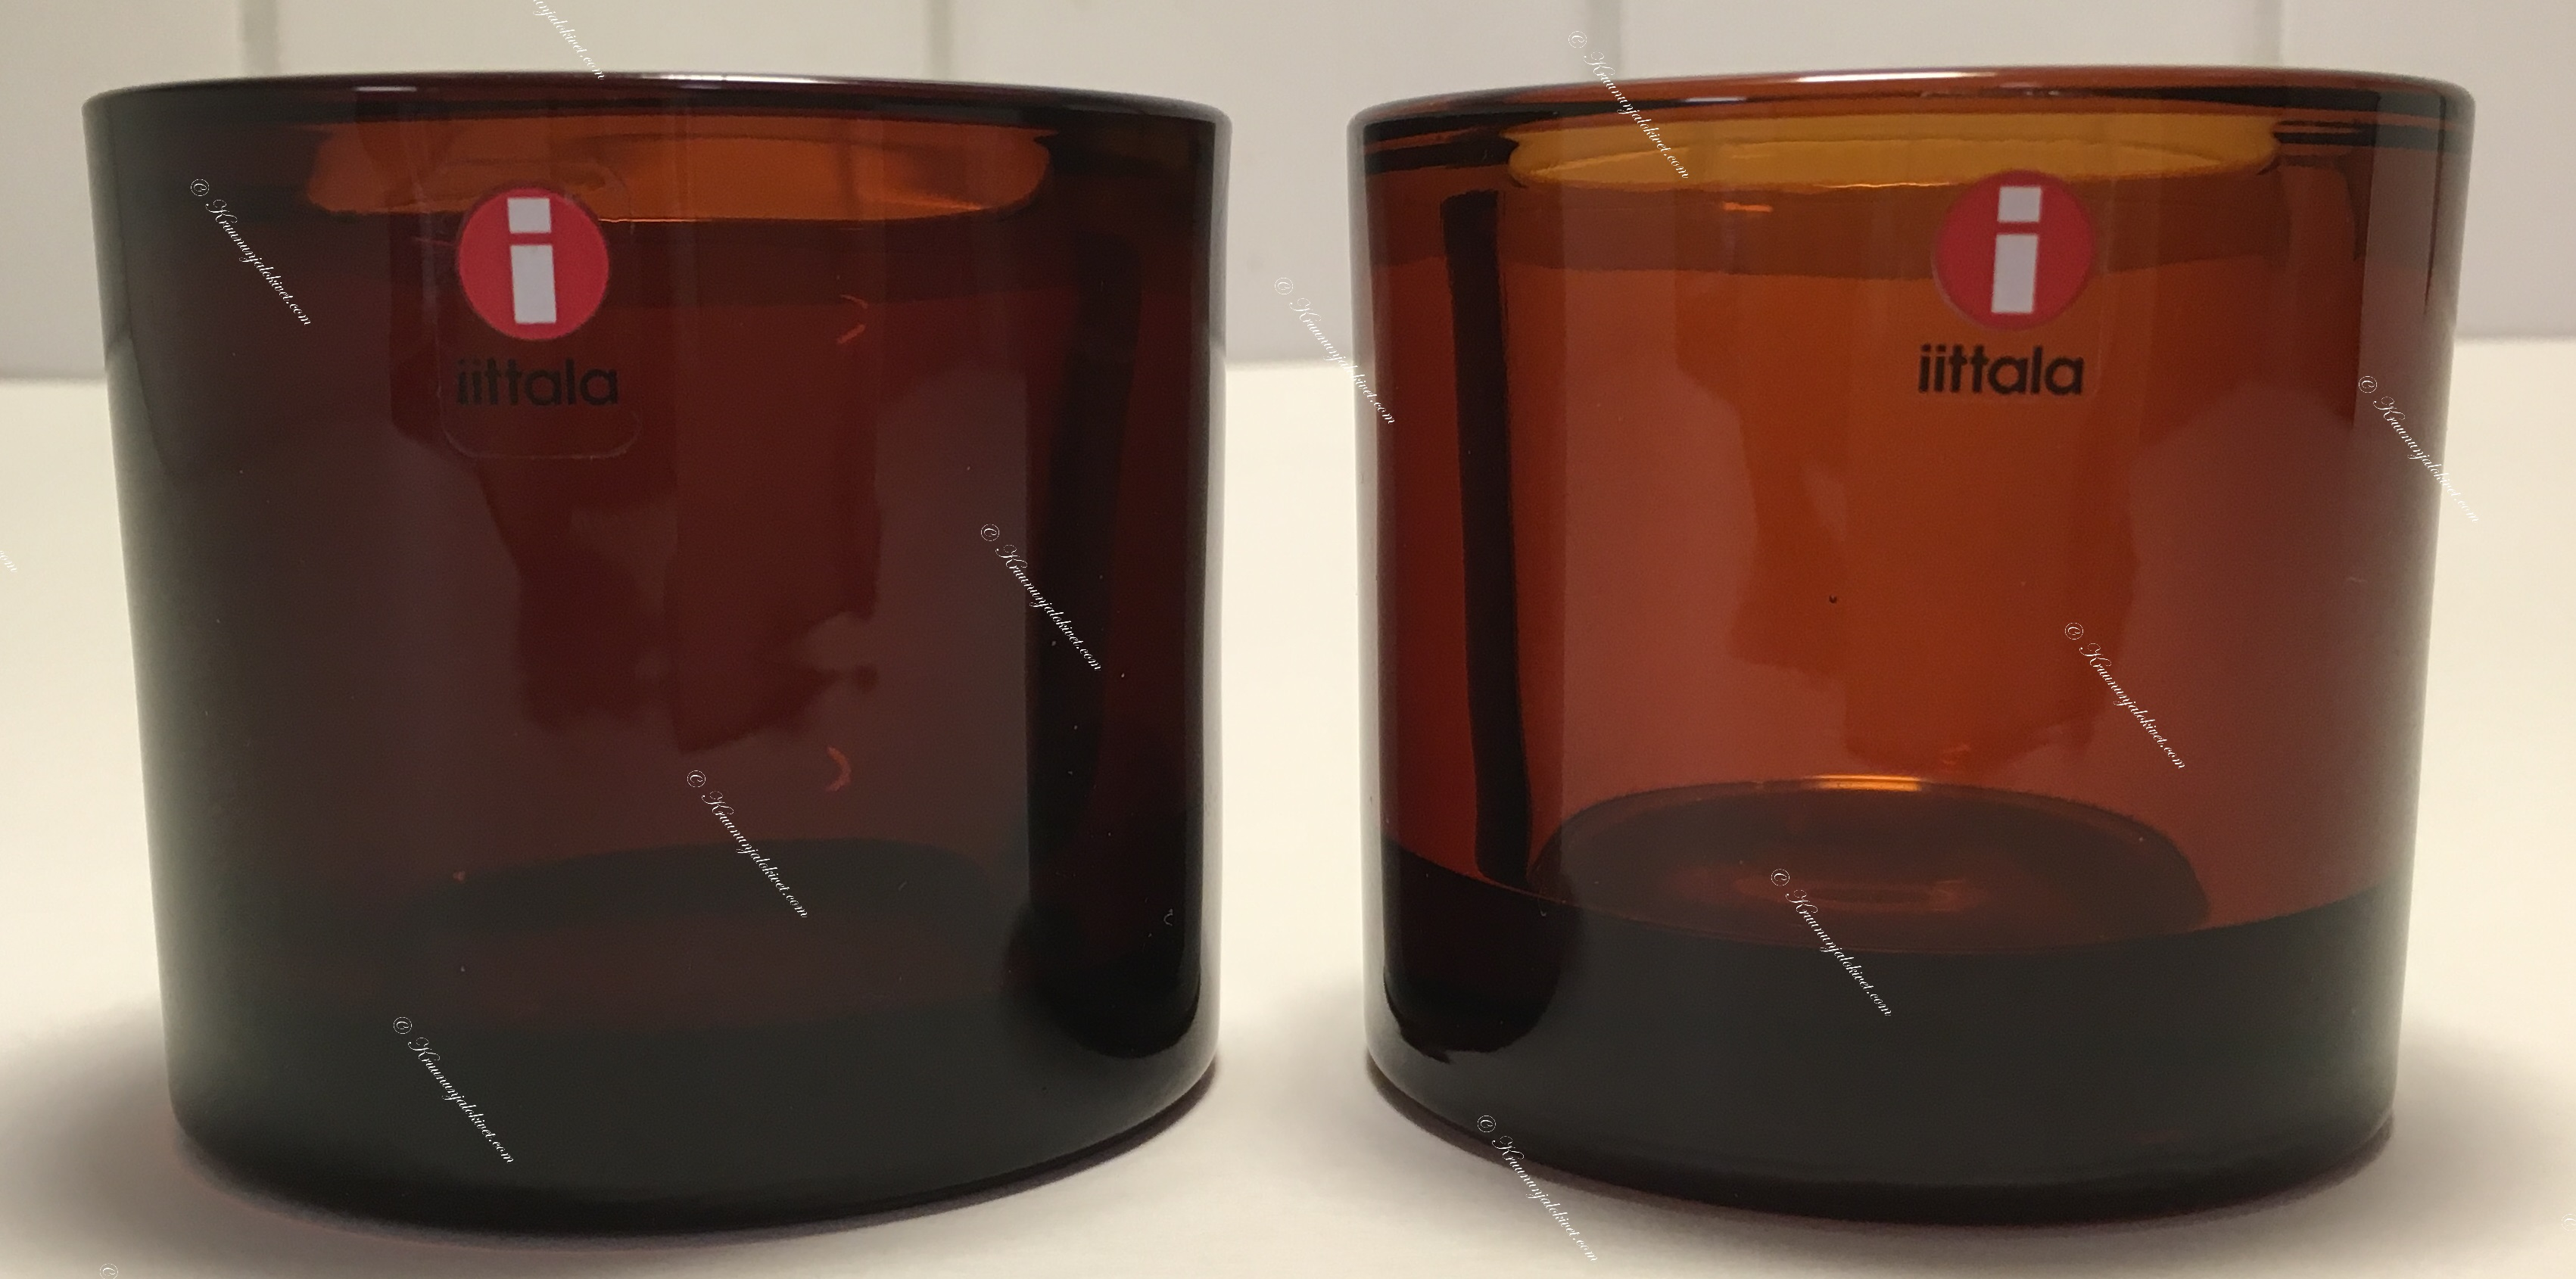 Japanin purppura oikealla · Japanin ruskea oikealla dcbe18af0a6ec